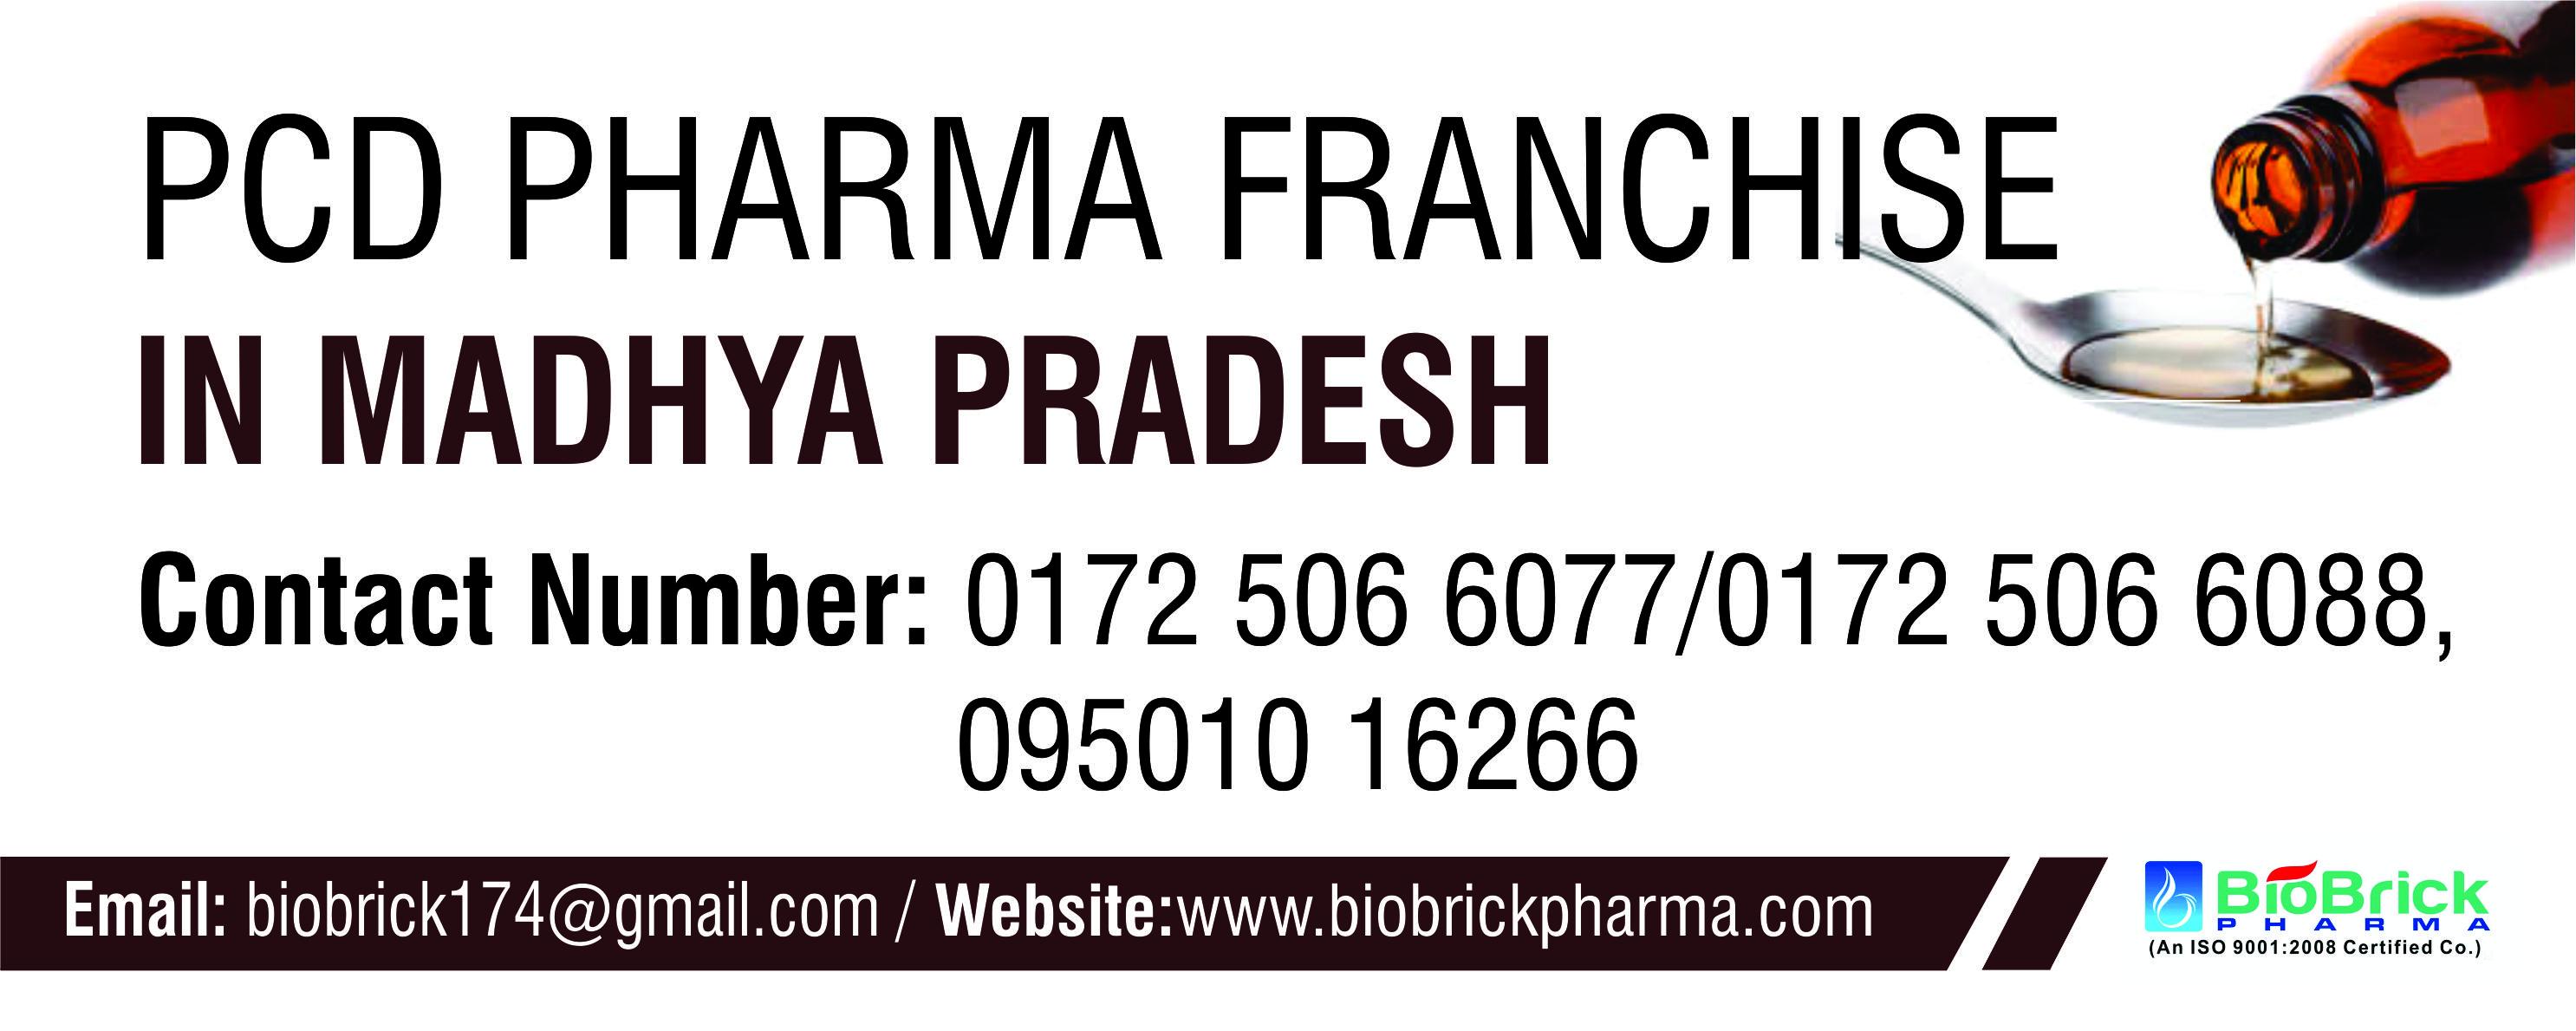 Pharma PCD franchise company in Madhya Pradesh